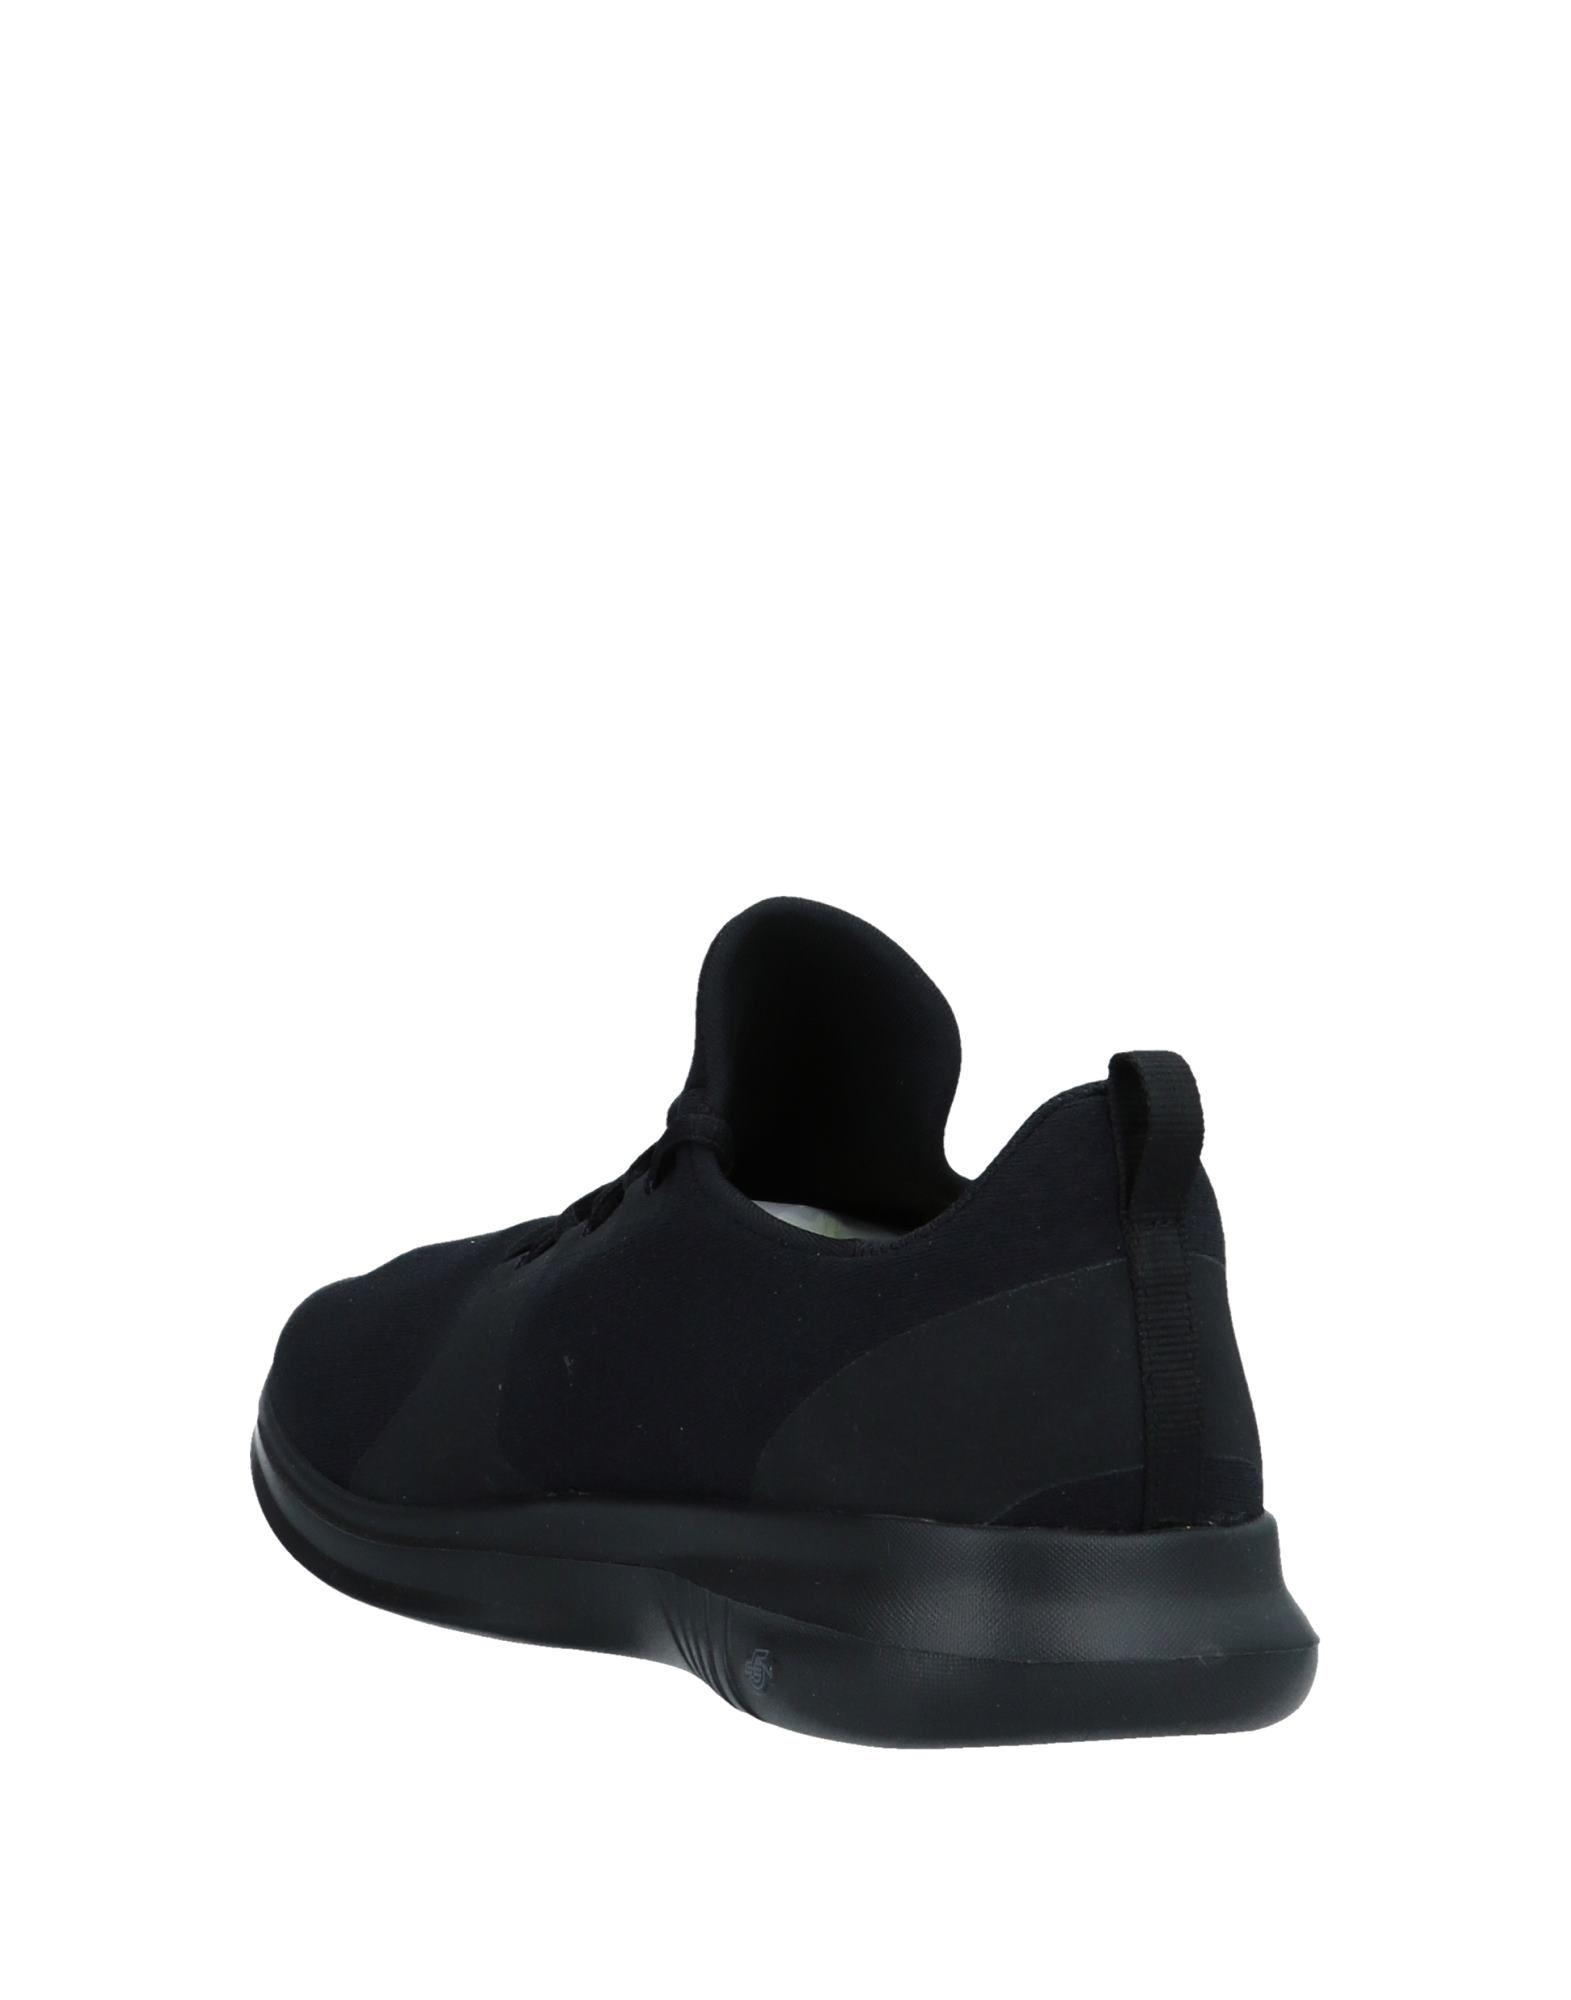 Skechers Sneakers - Women Skechers Sneakers Sneakers Sneakers online on  United Kingdom - 11554837HJ 8ab620